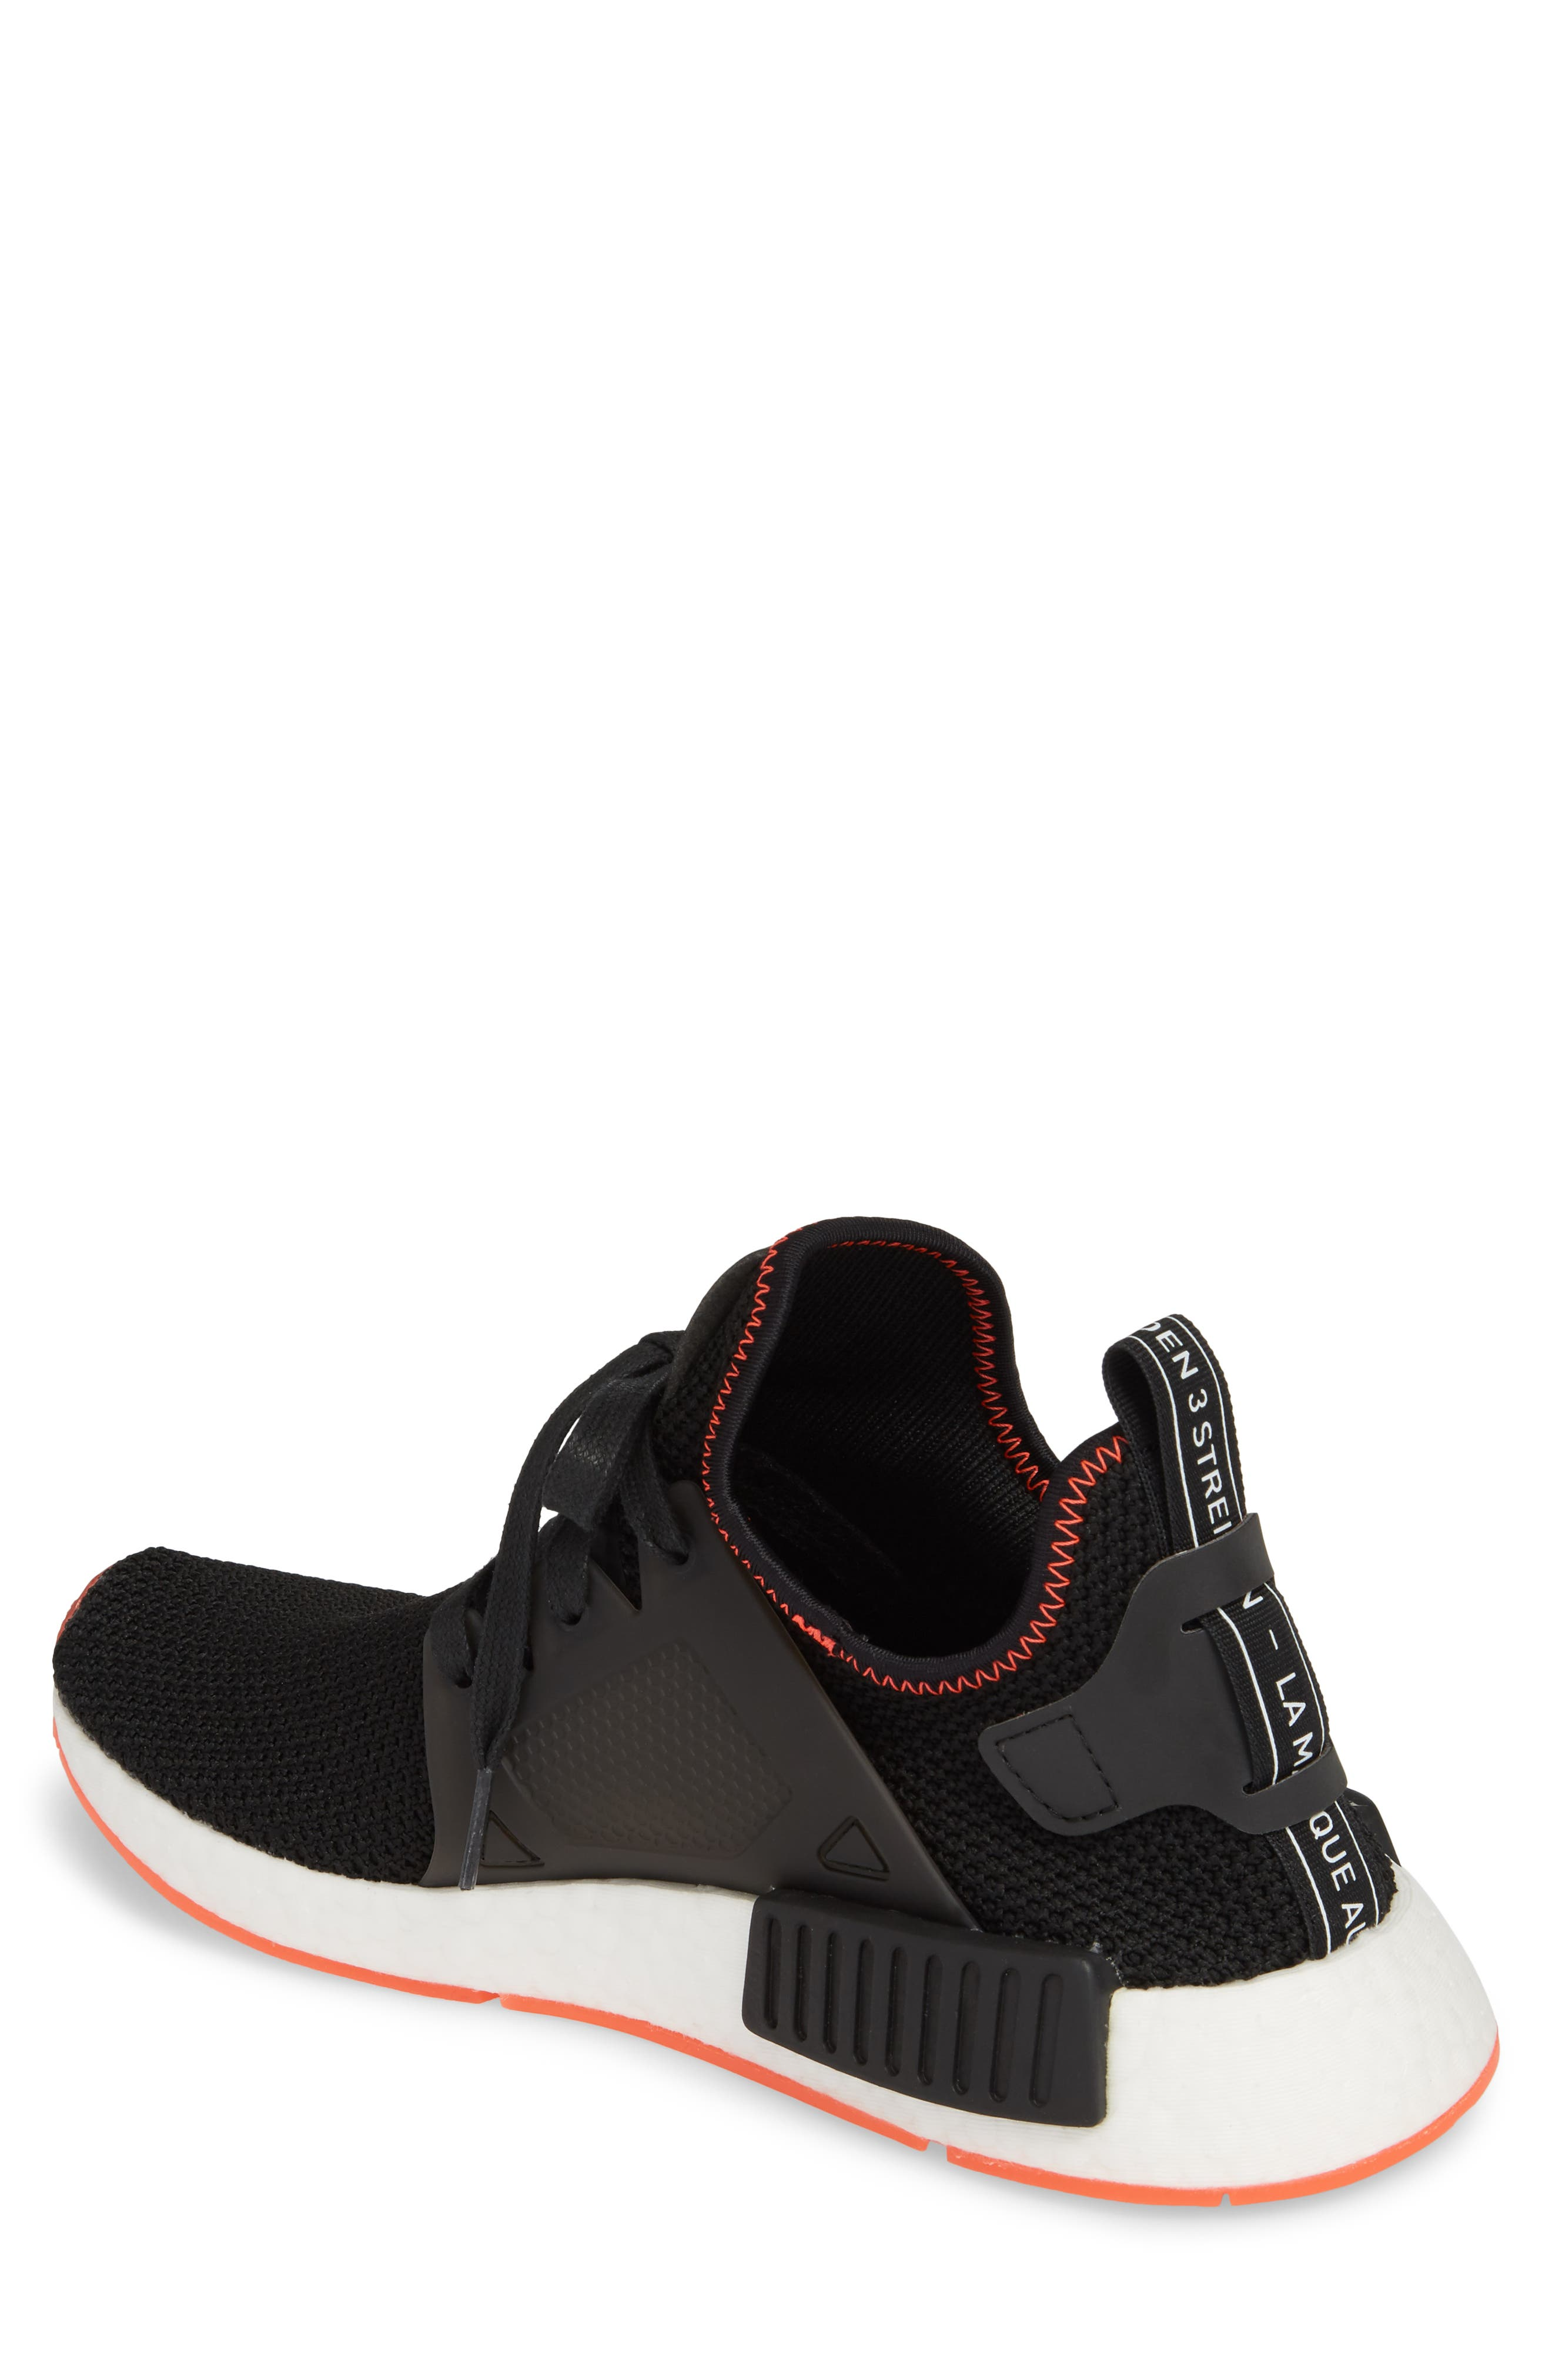 NMD_XR1 Sneaker,                             Alternate thumbnail 3, color,